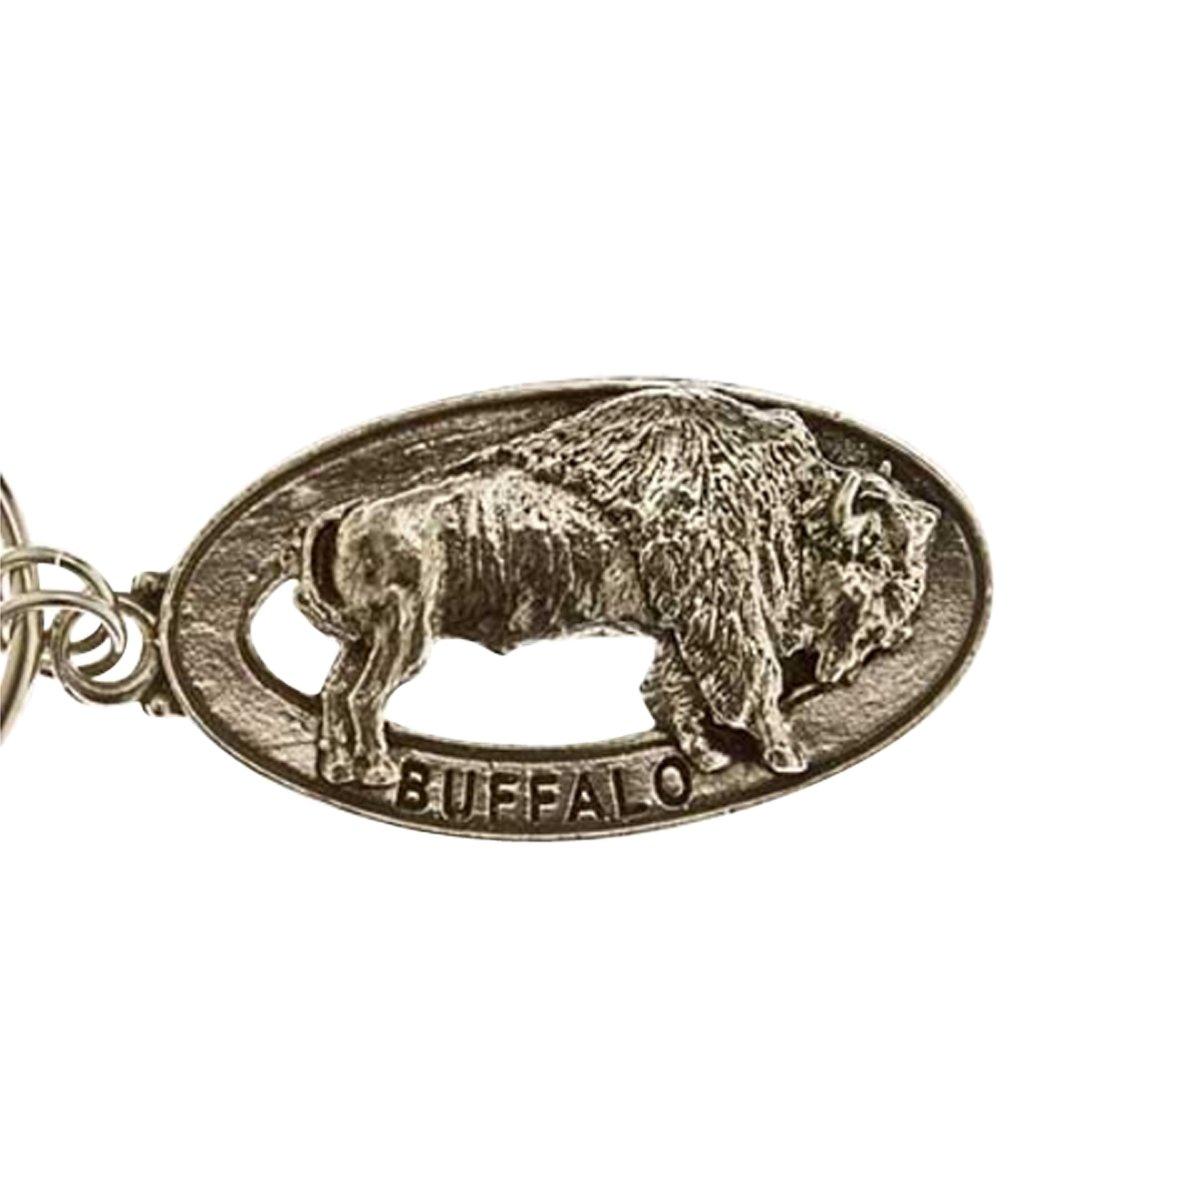 Creative Pewter Designs, Pewter Buffalo Key Chain, Antiqued Finish, MK029